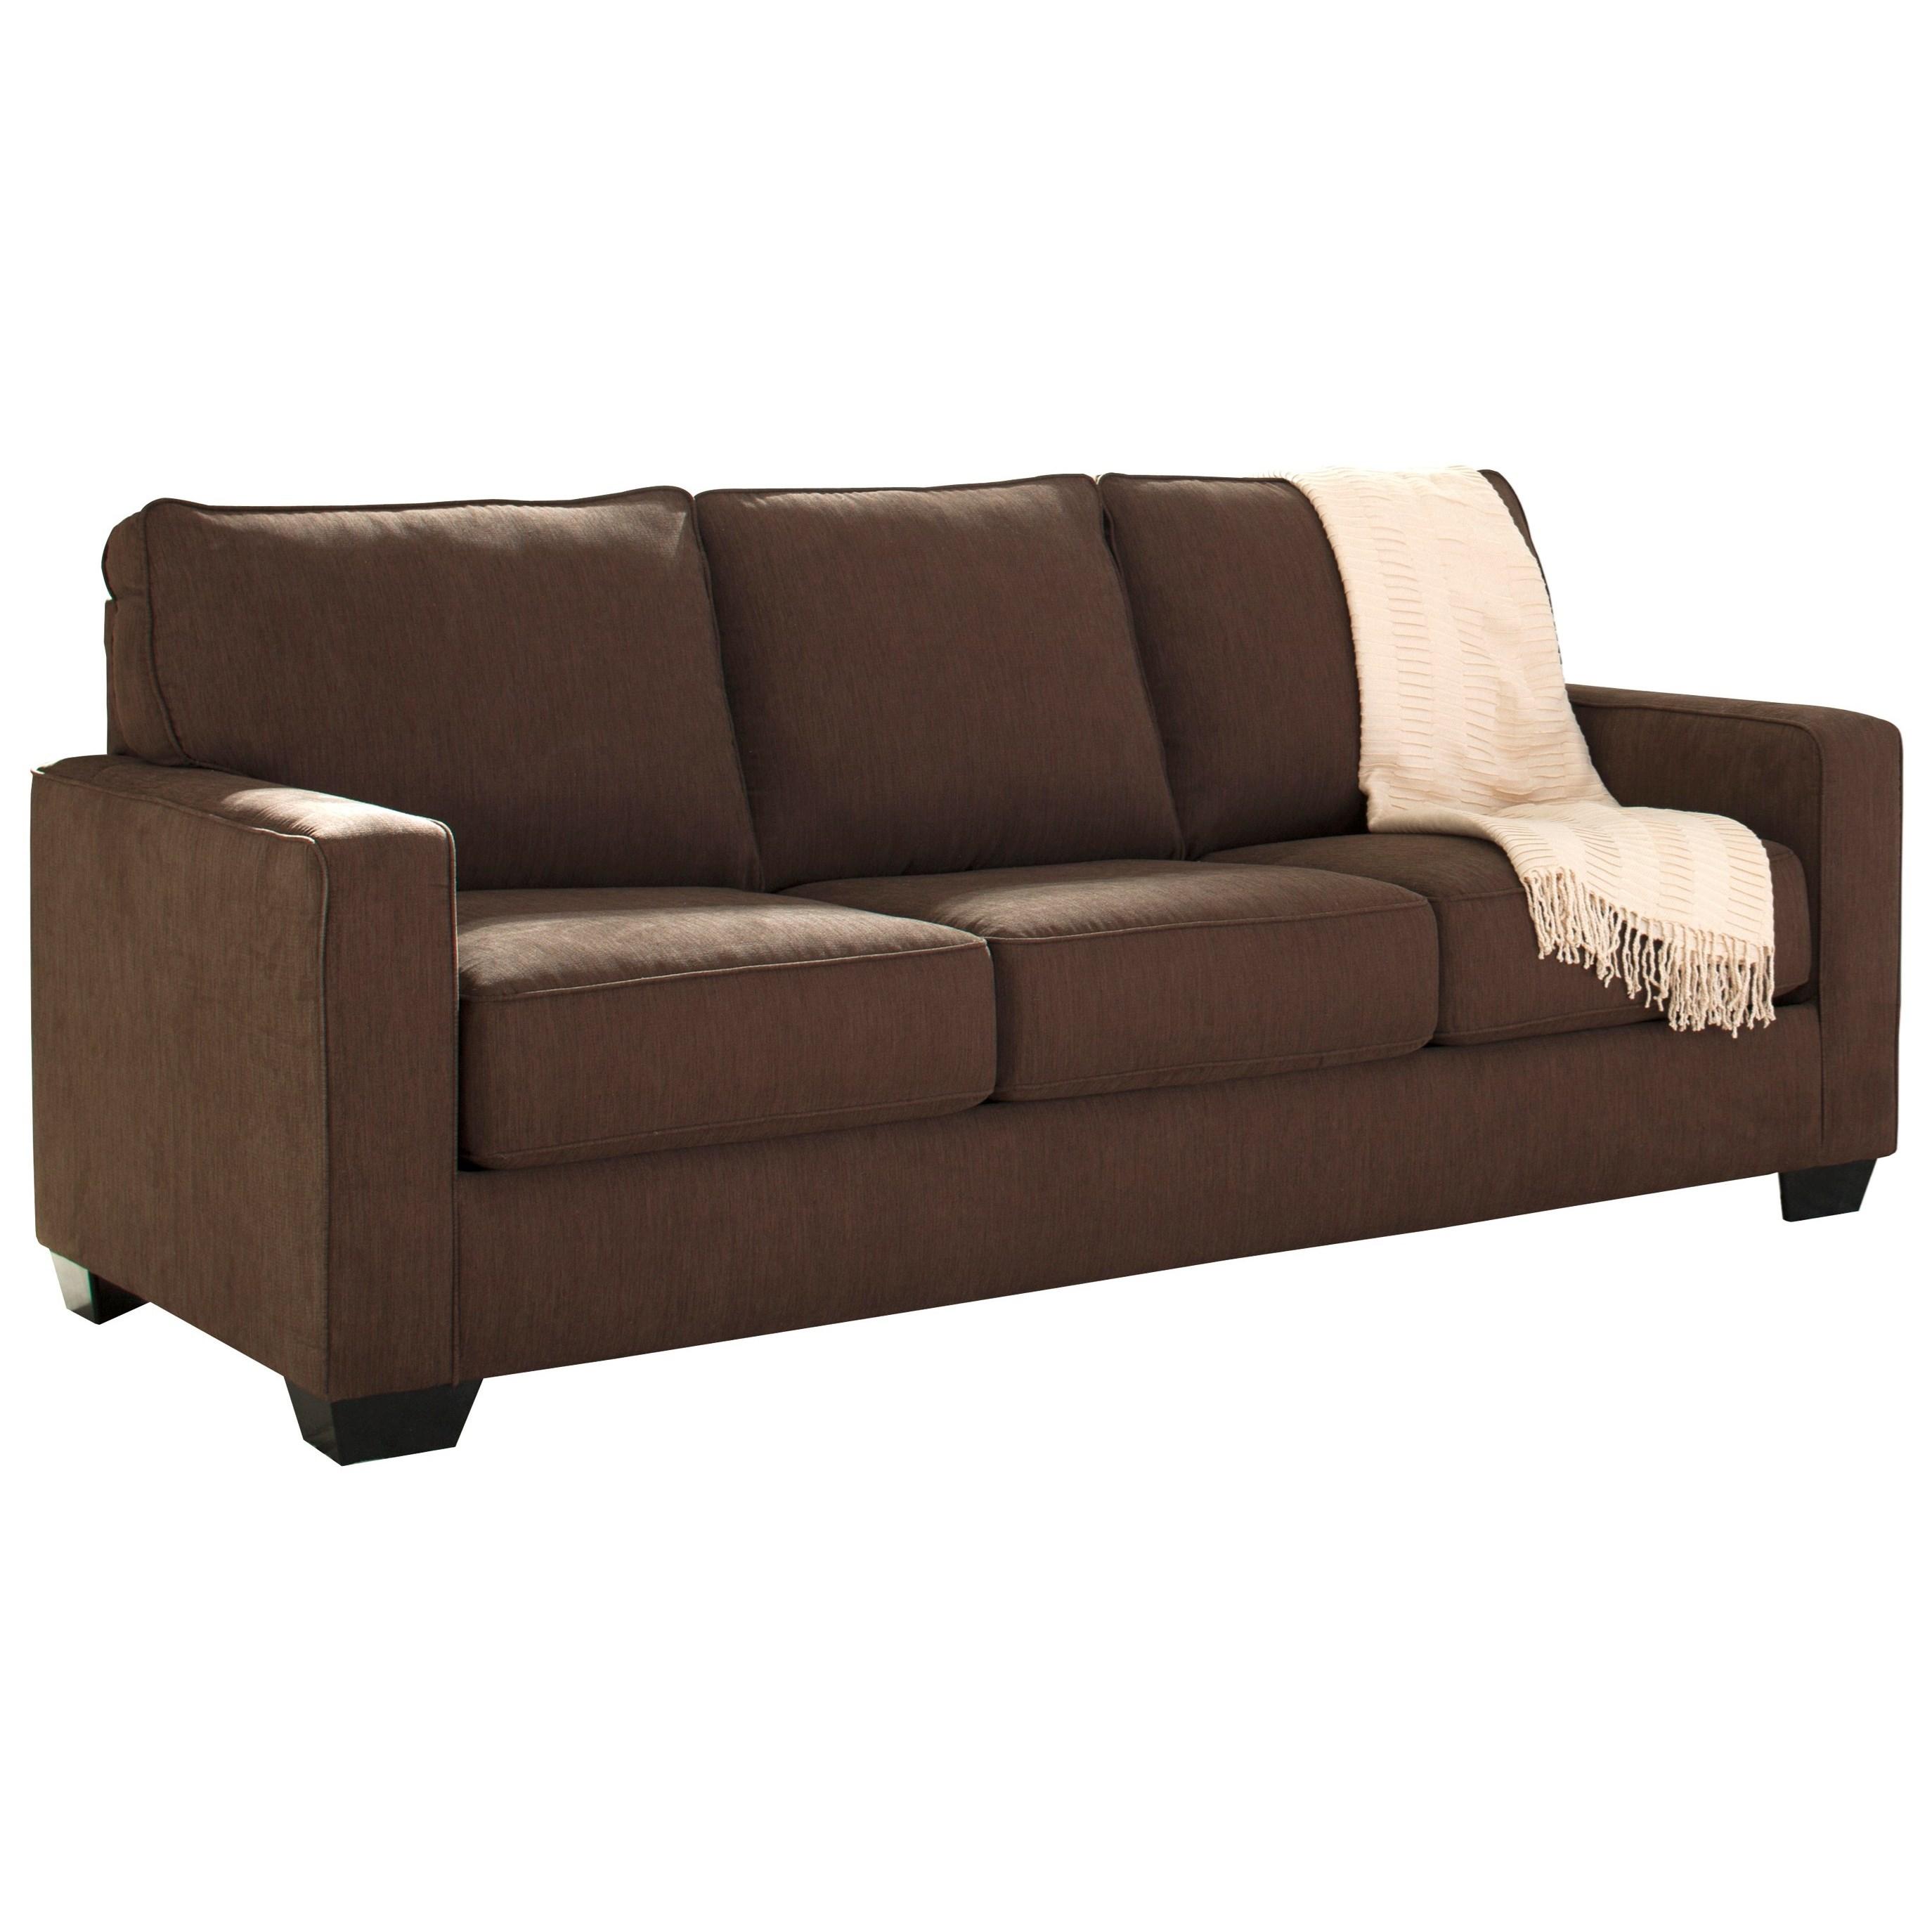 Zoe Queen Sofa Sleeper With Memory Foam Mattress | Ruby Gordon Home | Sofa  Sleeper